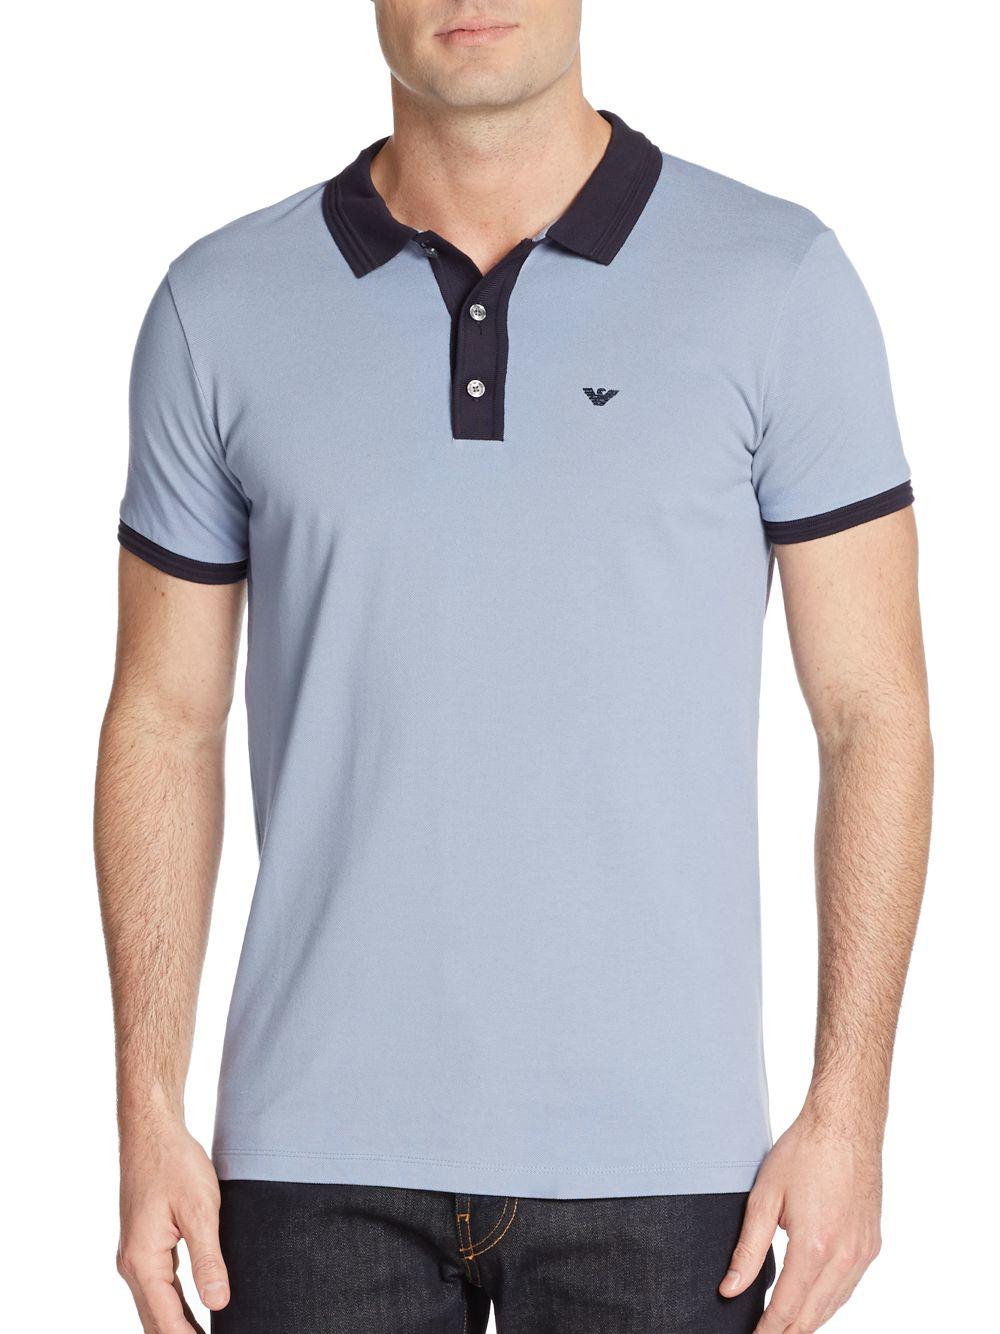 0899ffe8 Emporio Armani Contrast Trim Polo Shirt in Blue for Men - Lyst